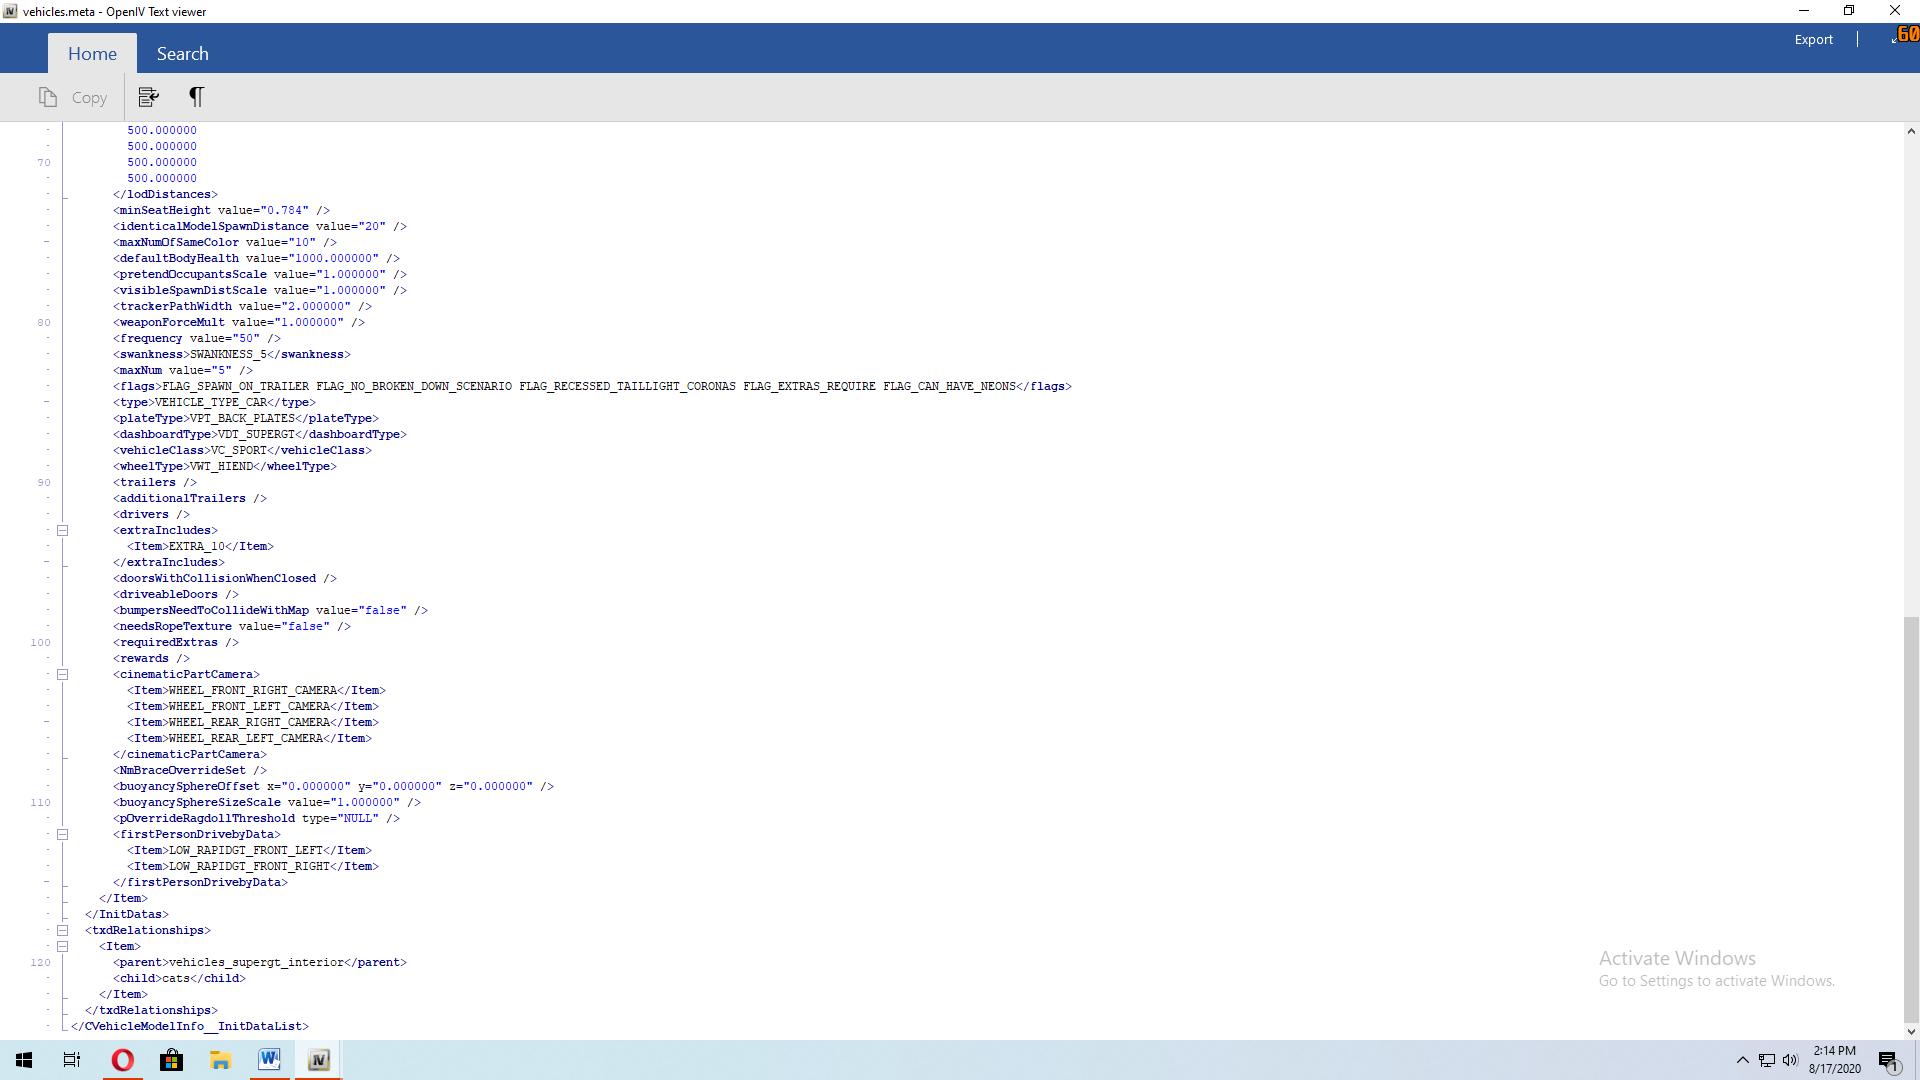 0_1597662929510_Screenshot (49).png